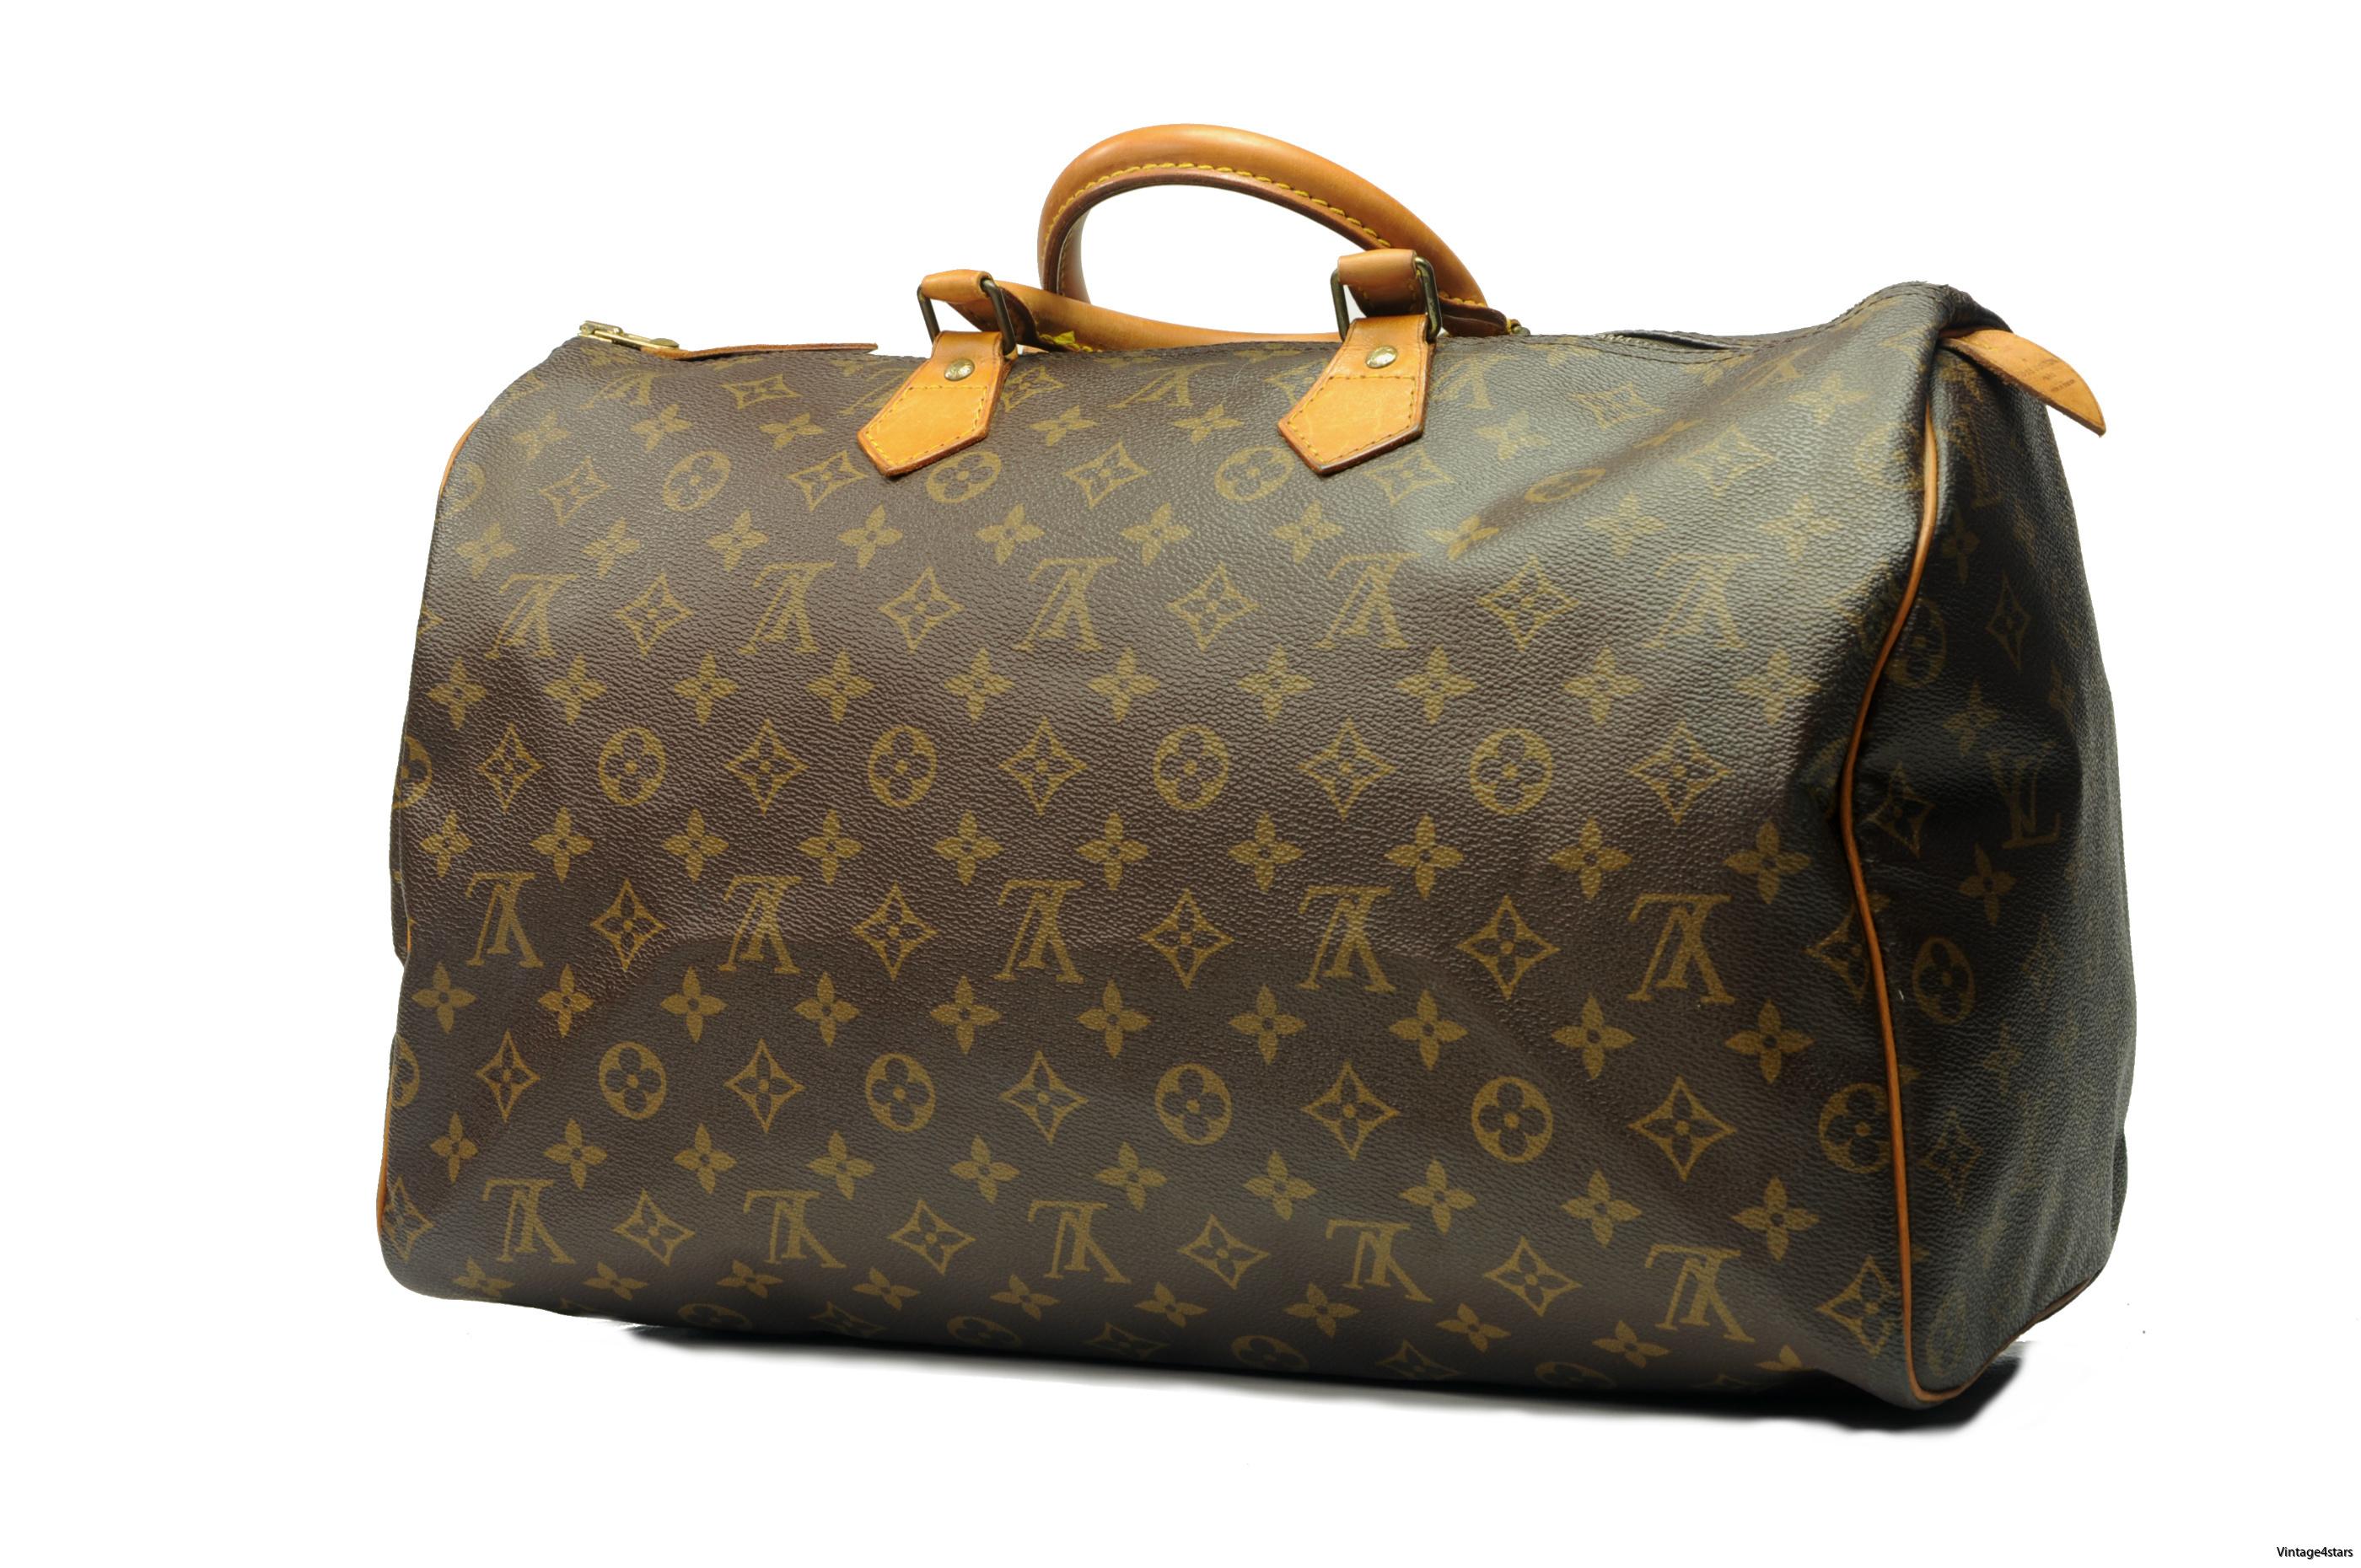 Louis Vuitton Speedy 40 Monogram 4